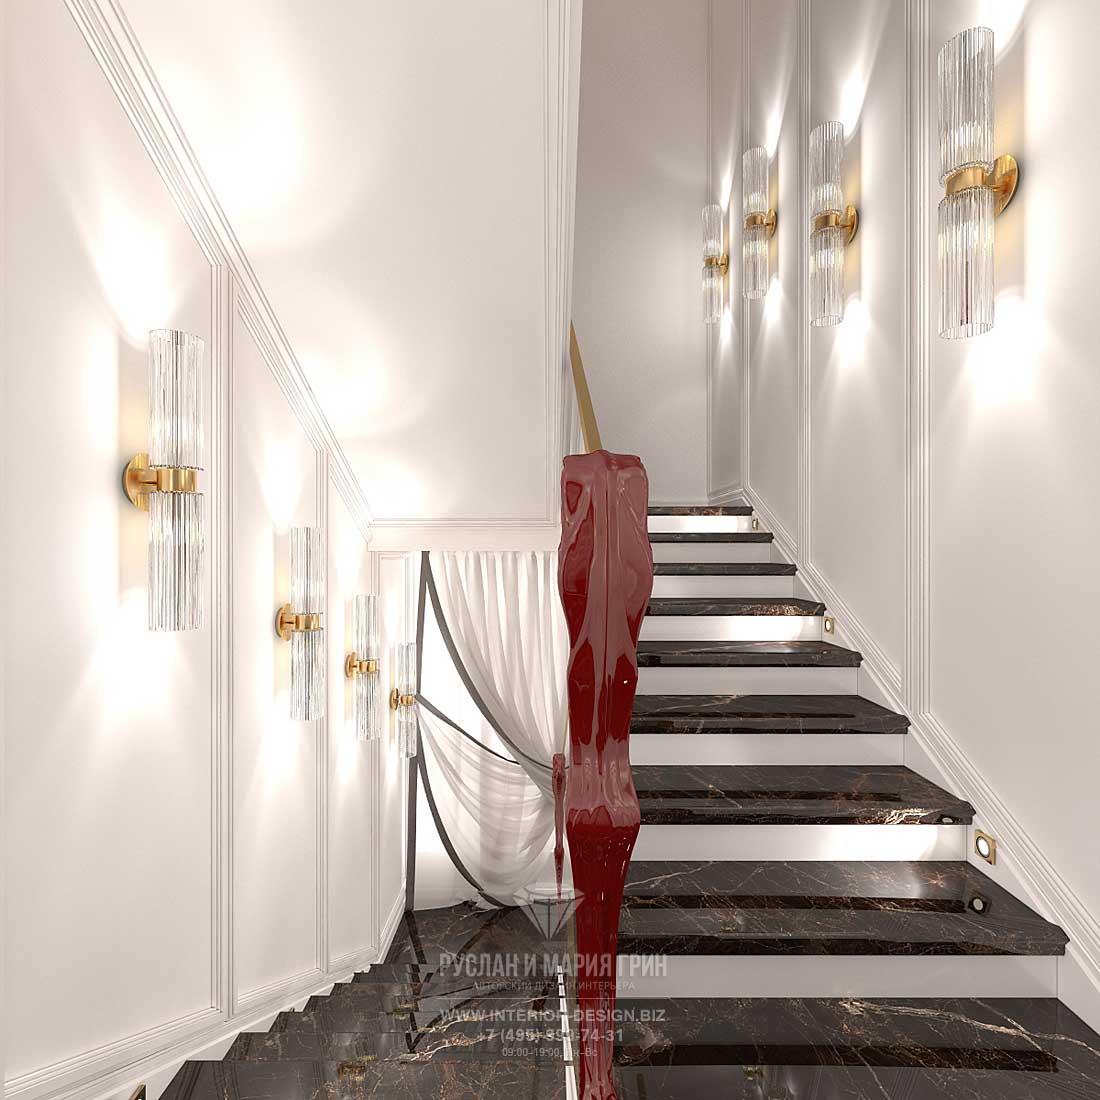 Интерьер роскошной лестницы ар-деко